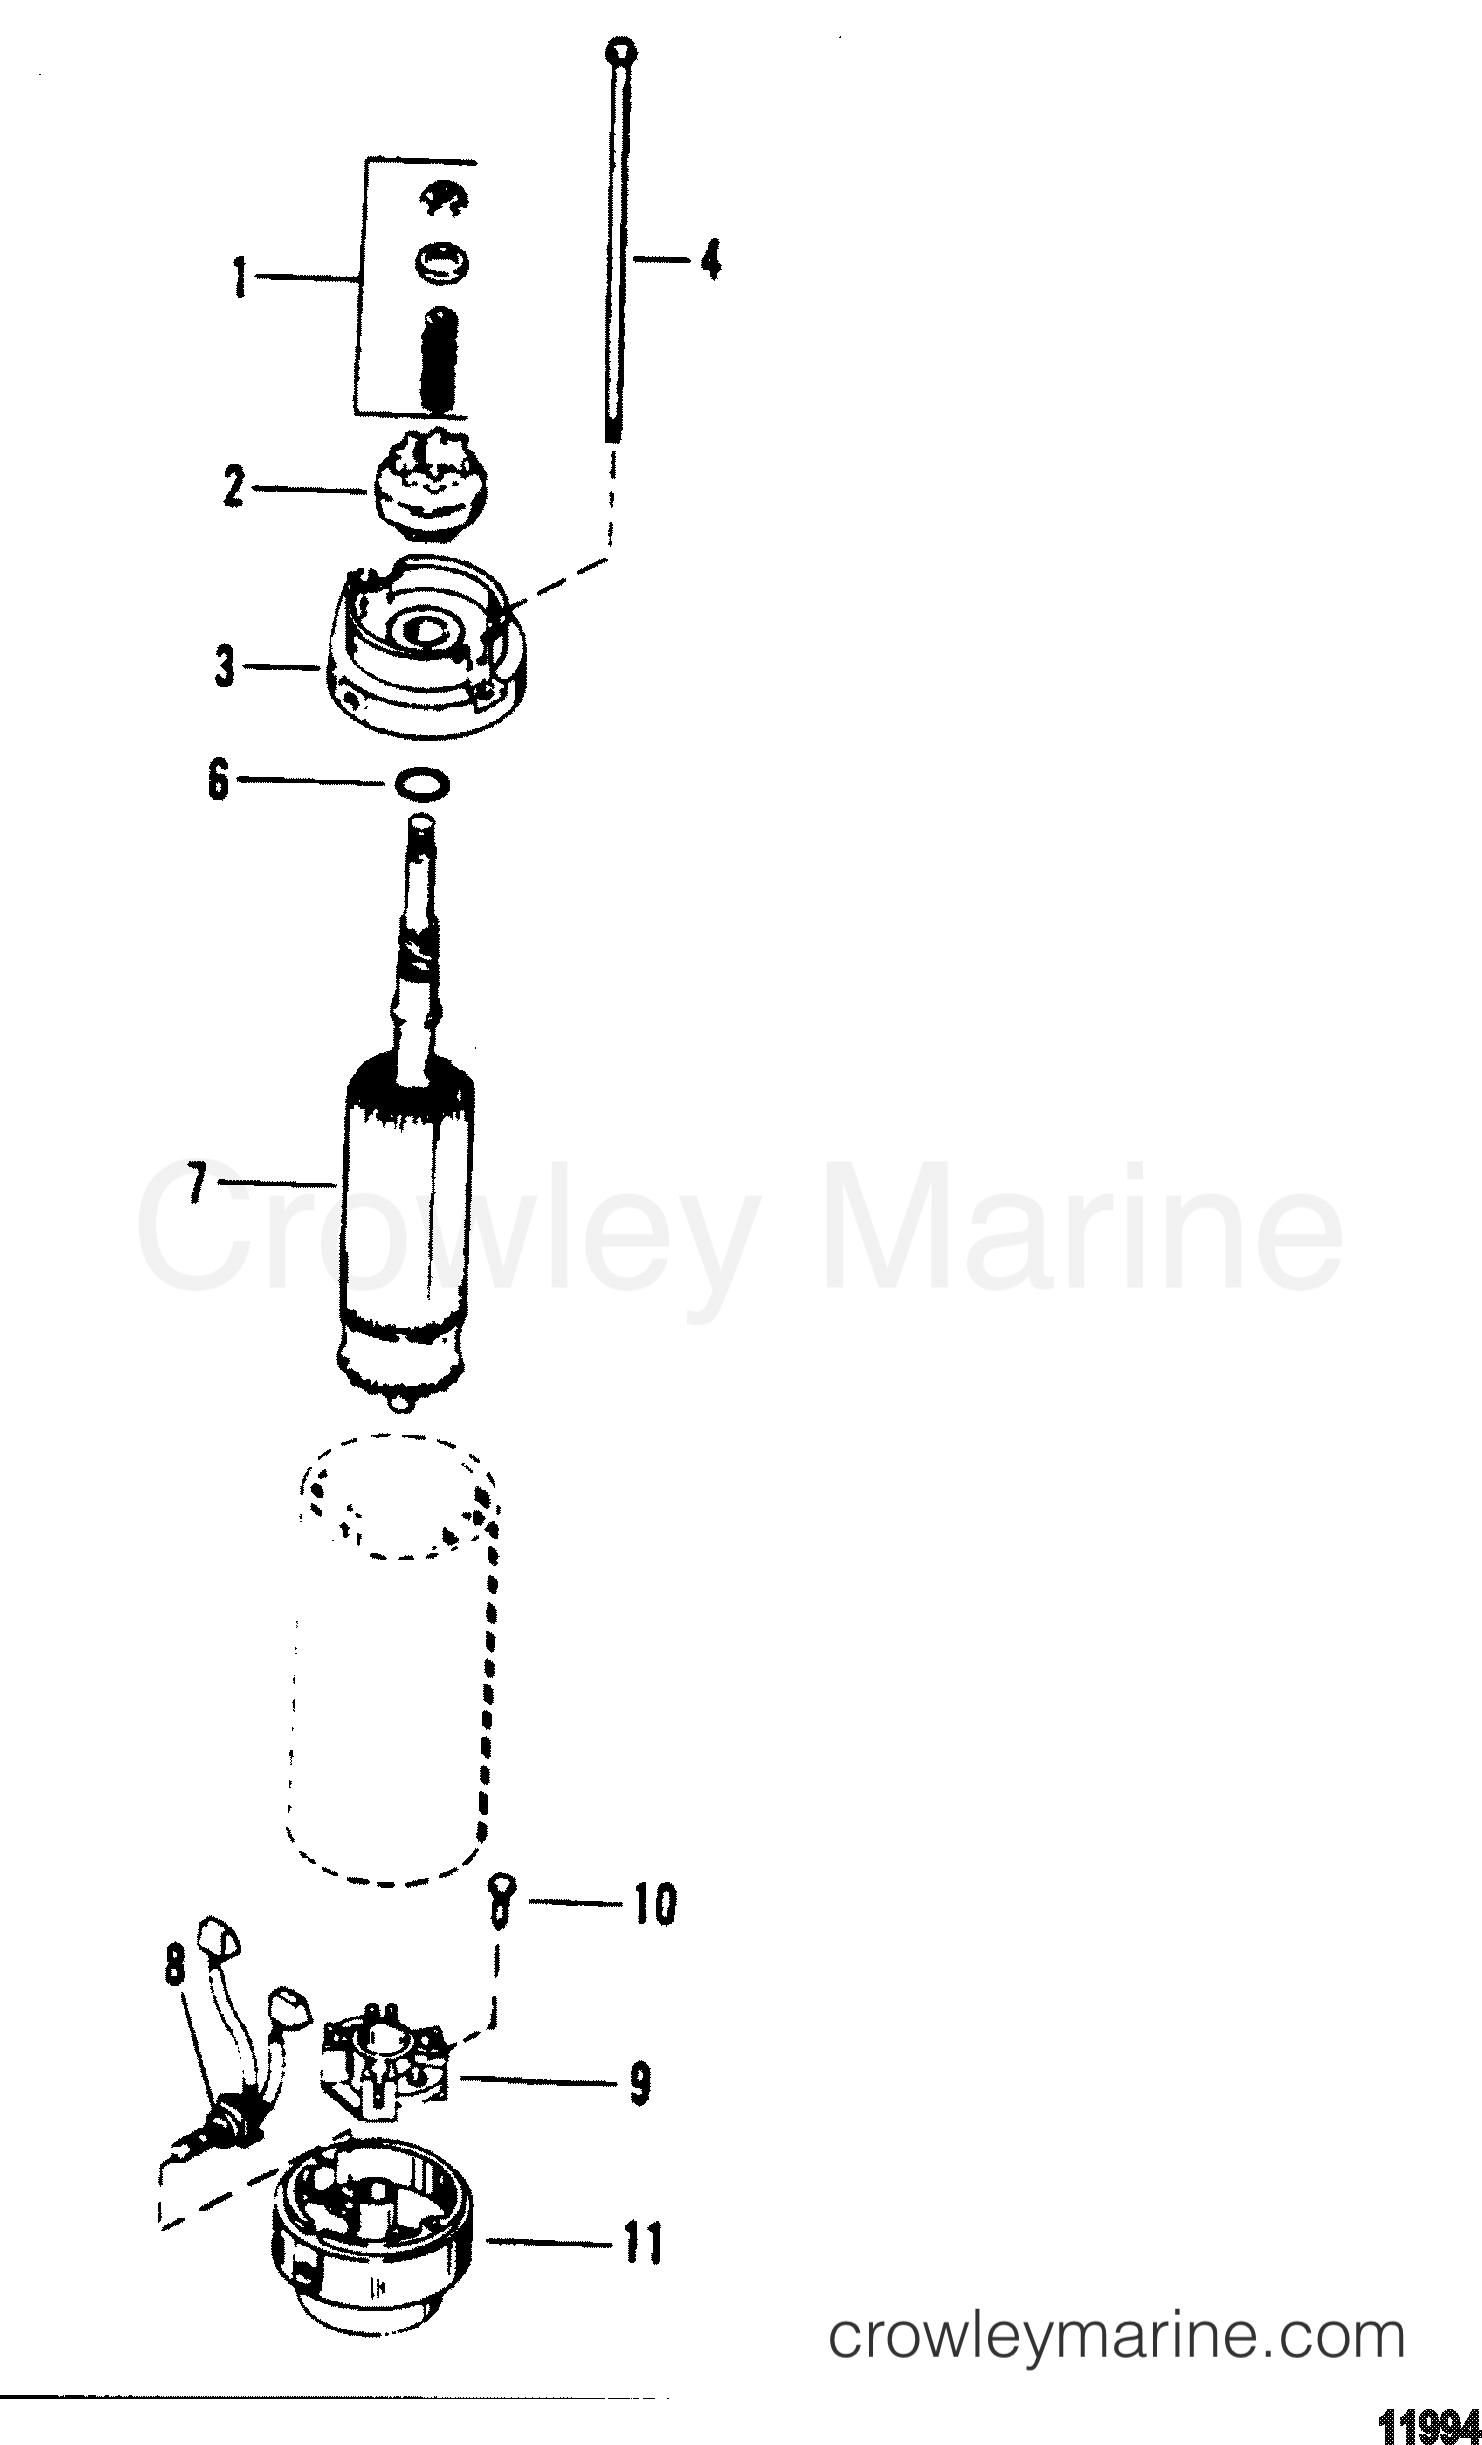 1979 mercury 150 hp outboard wiring diagram 1975 corvette starter motor american bosch 14916 24 m030sm